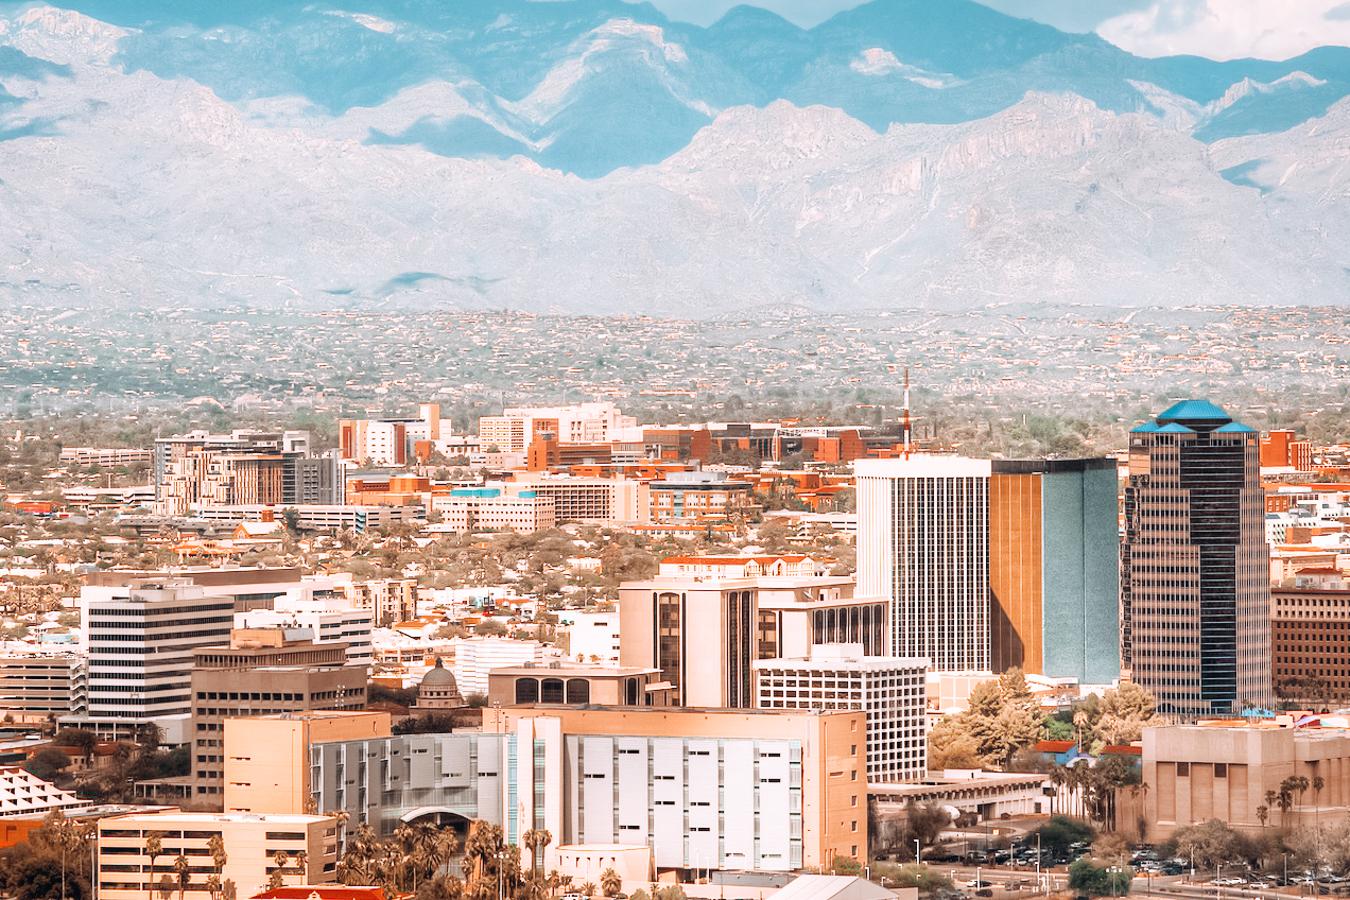 View of Tucson